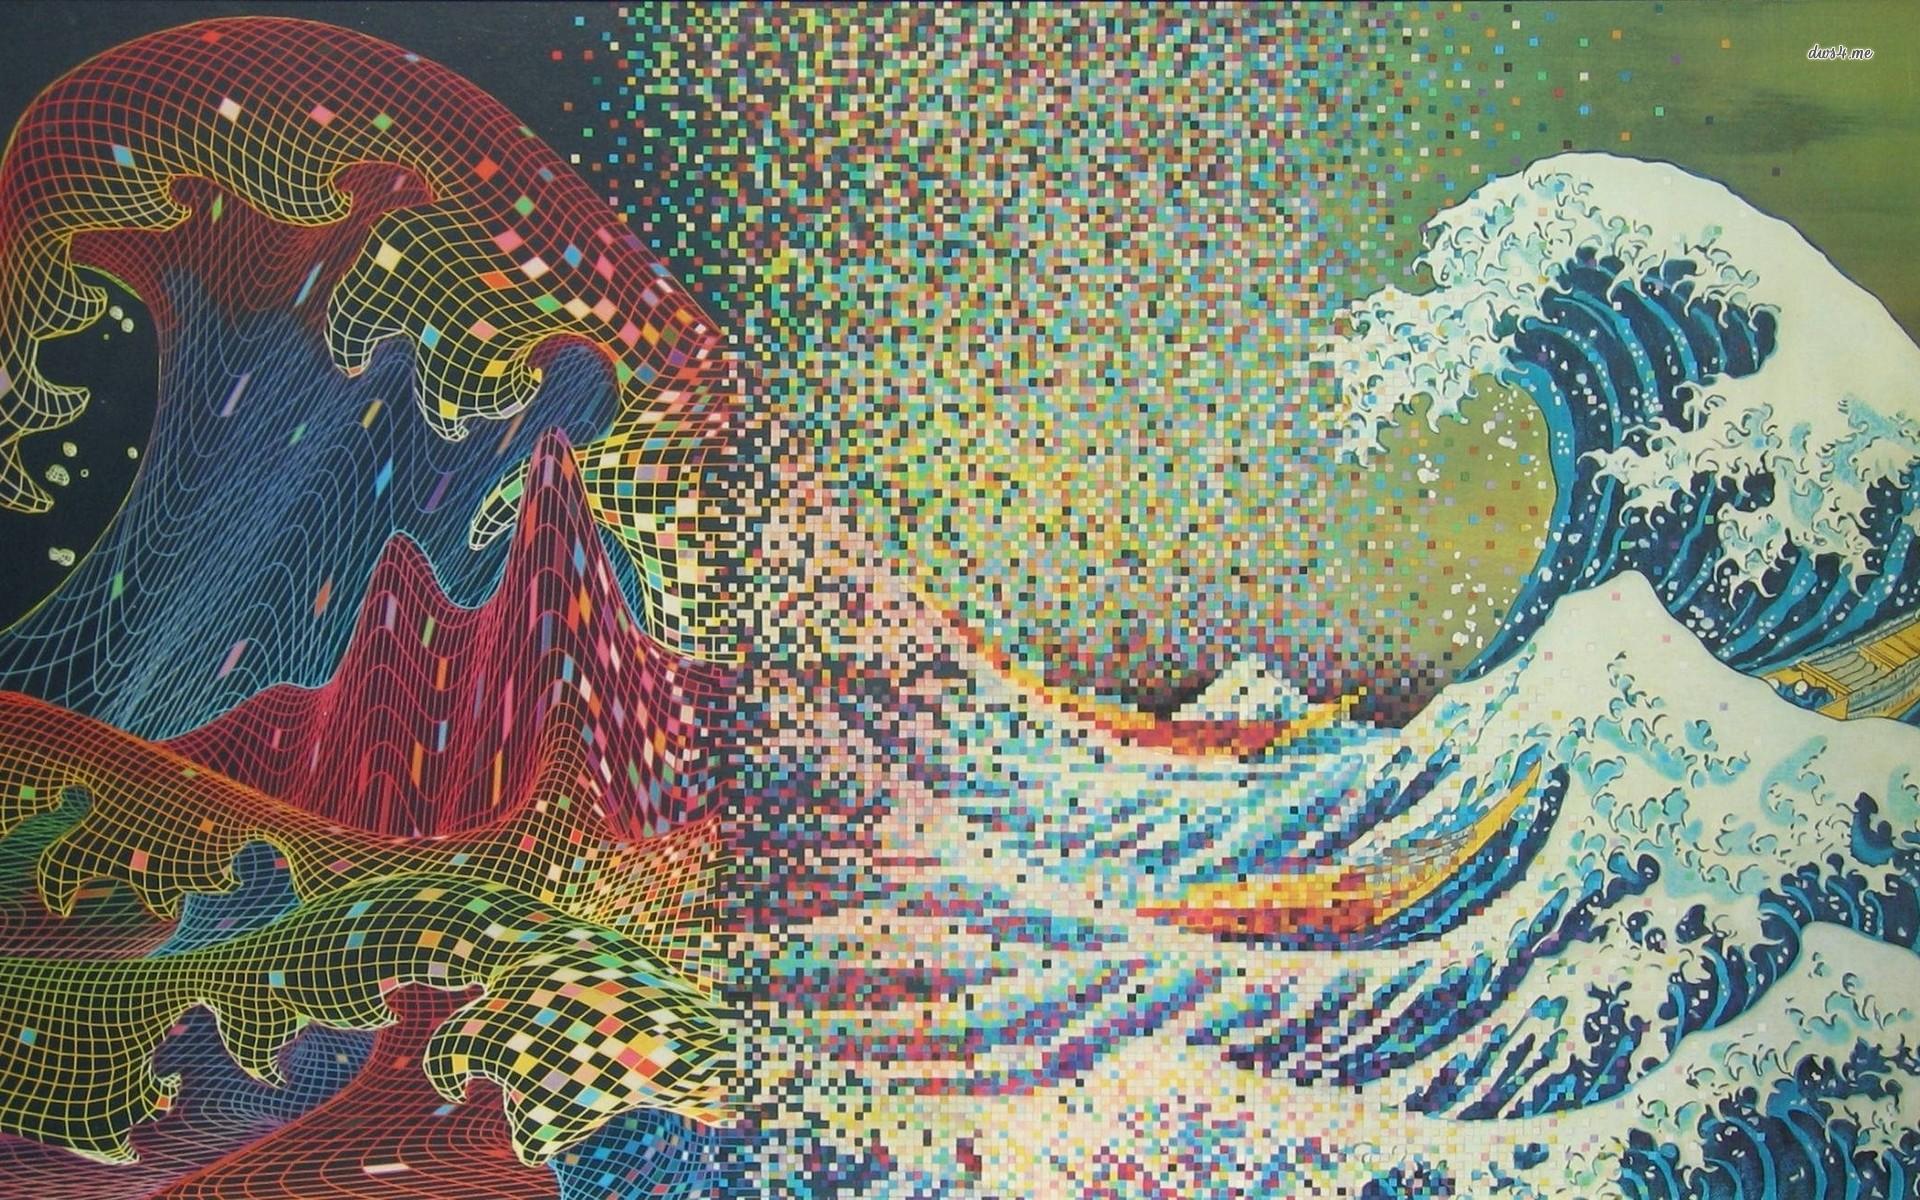 The Great Wave Off Kanagawa Iphone Wallpaper The Great Wave Off Kanagawa Wallpaper 183 ① Wallpapertag